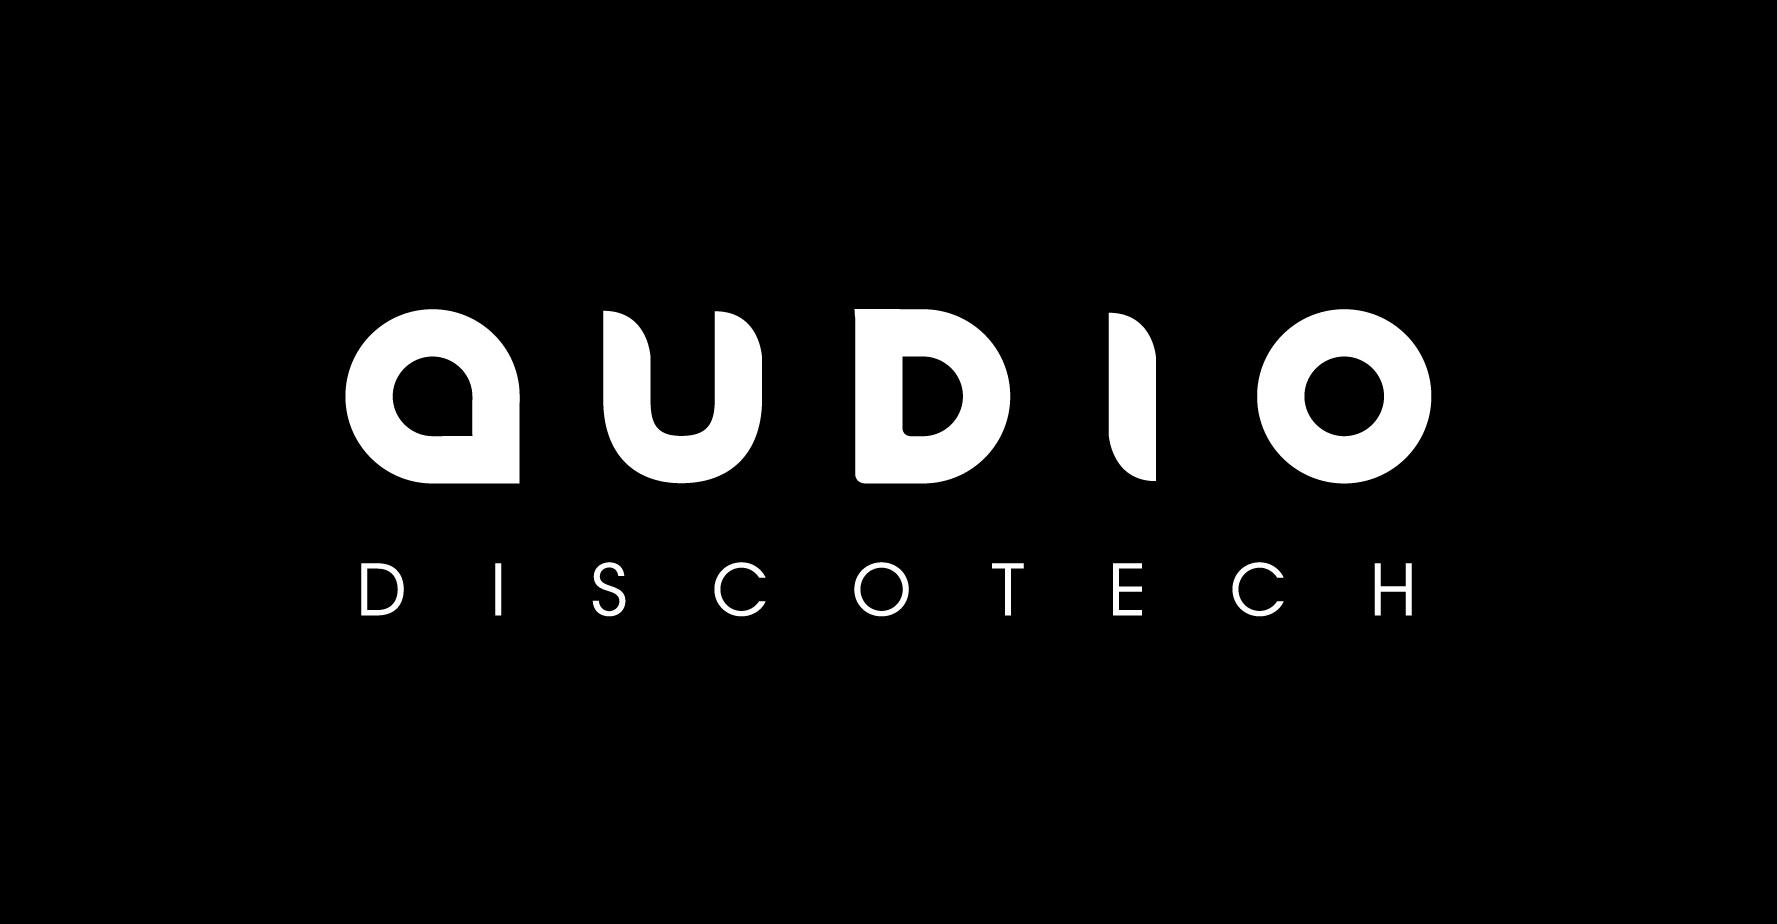 New Nightclub 'Audio Discotech' Prepares for SoMA Debut